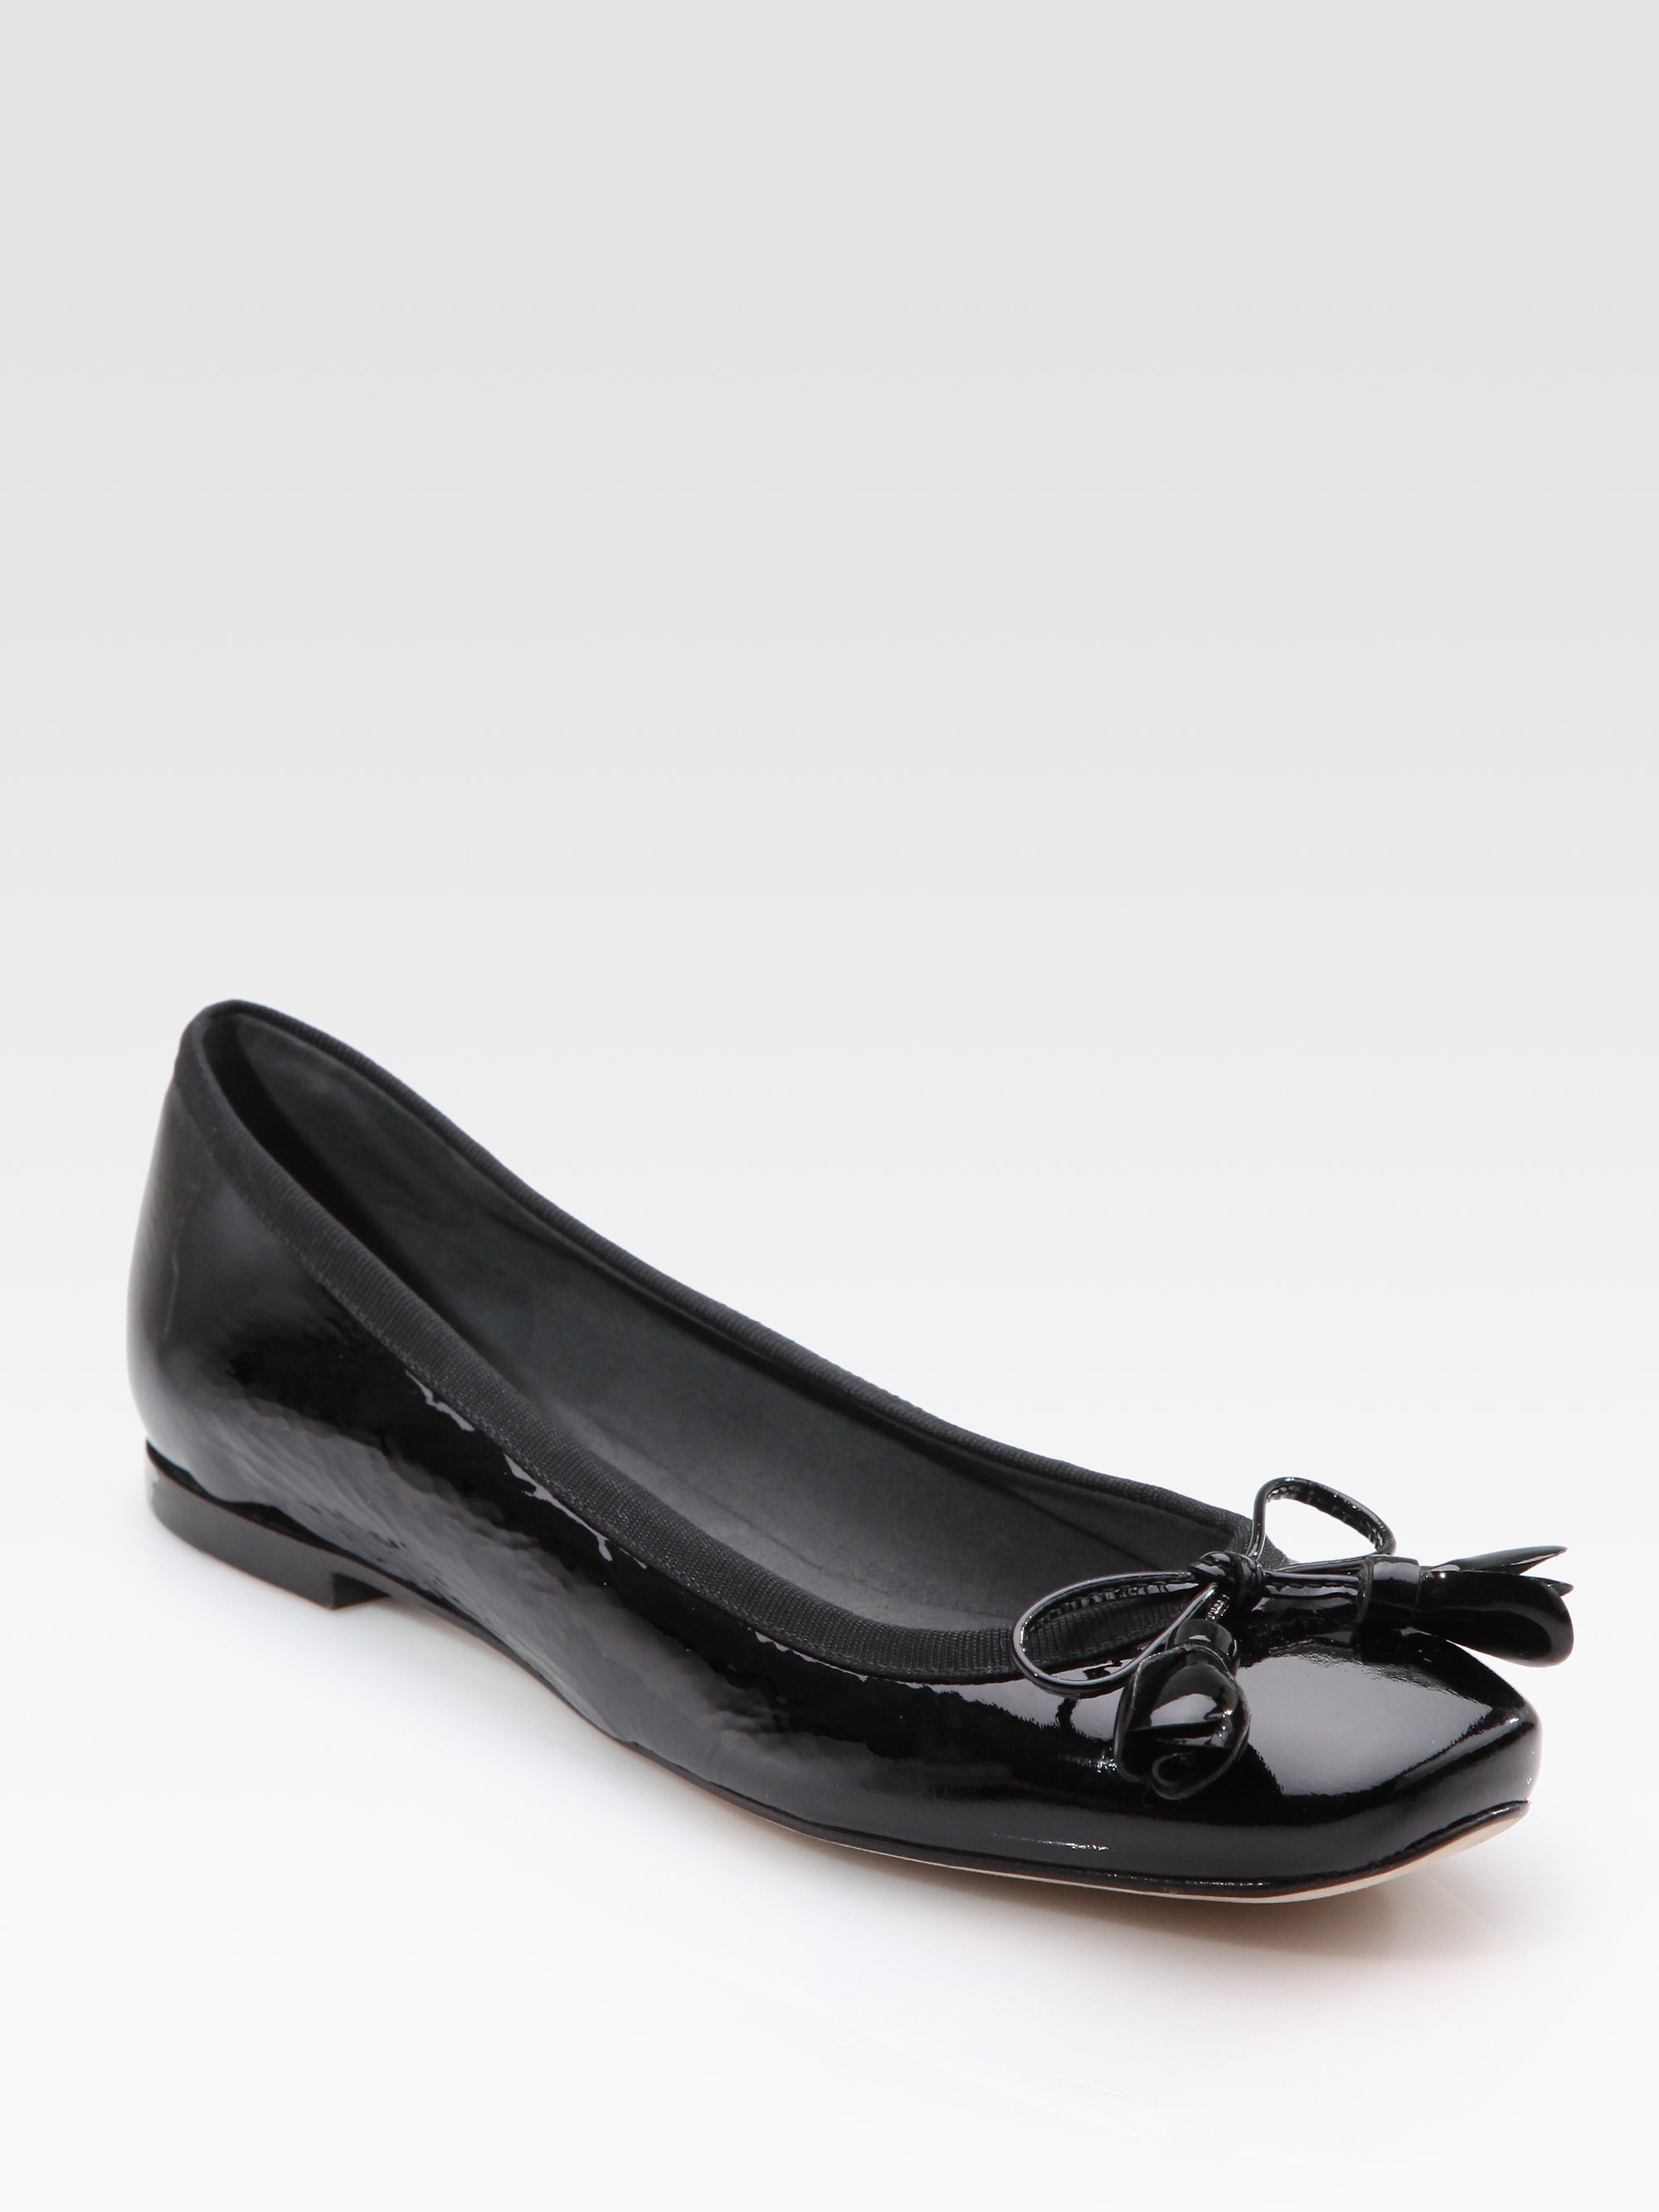 4da0966c469 Lyst - Stuart Weitzman Patent Leather Bow Ballet Flats in Black